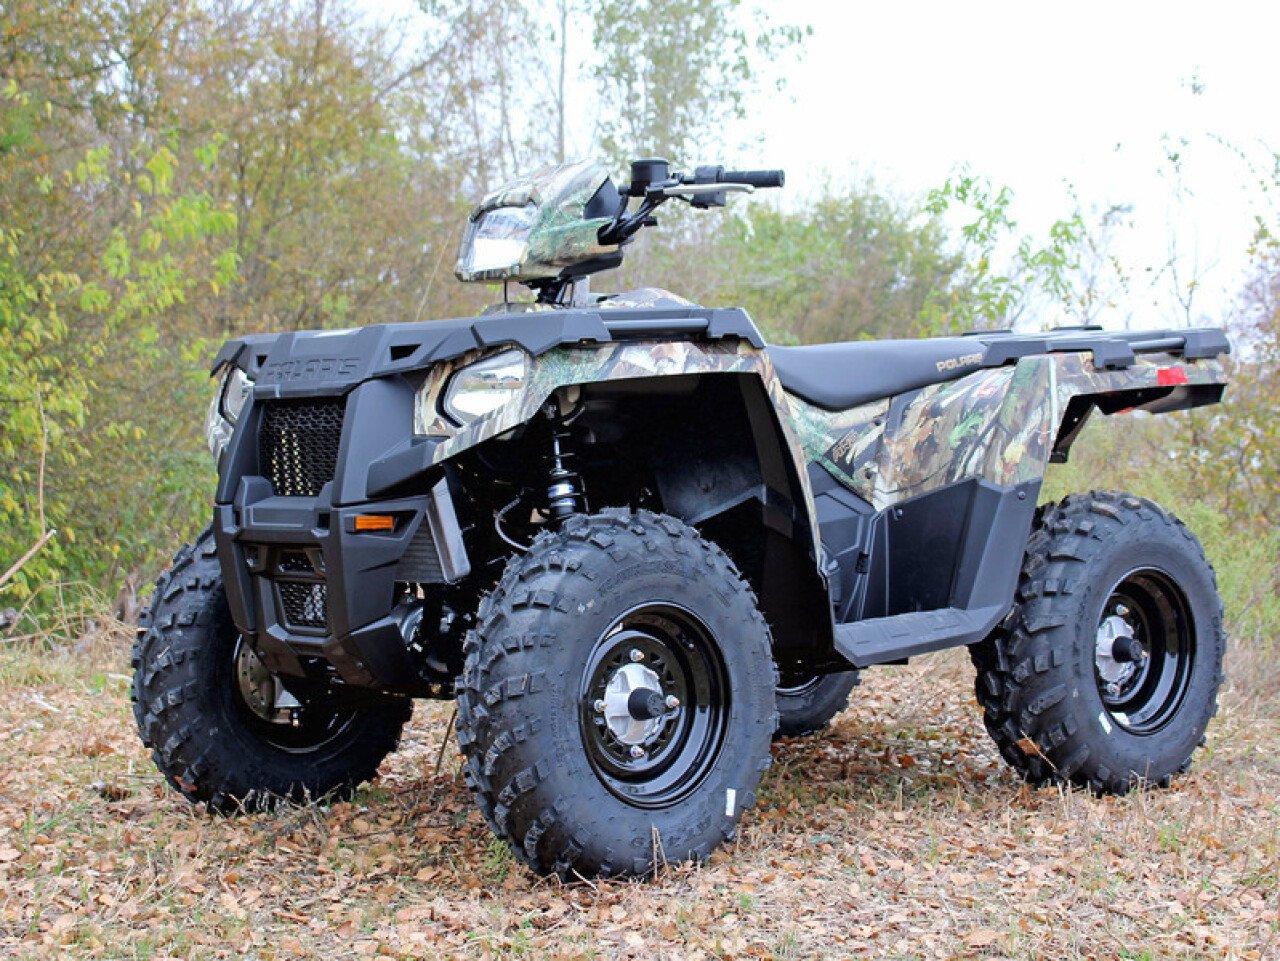 2018 Polaris Sportsman 570 for sale near Greenville, Texas ...